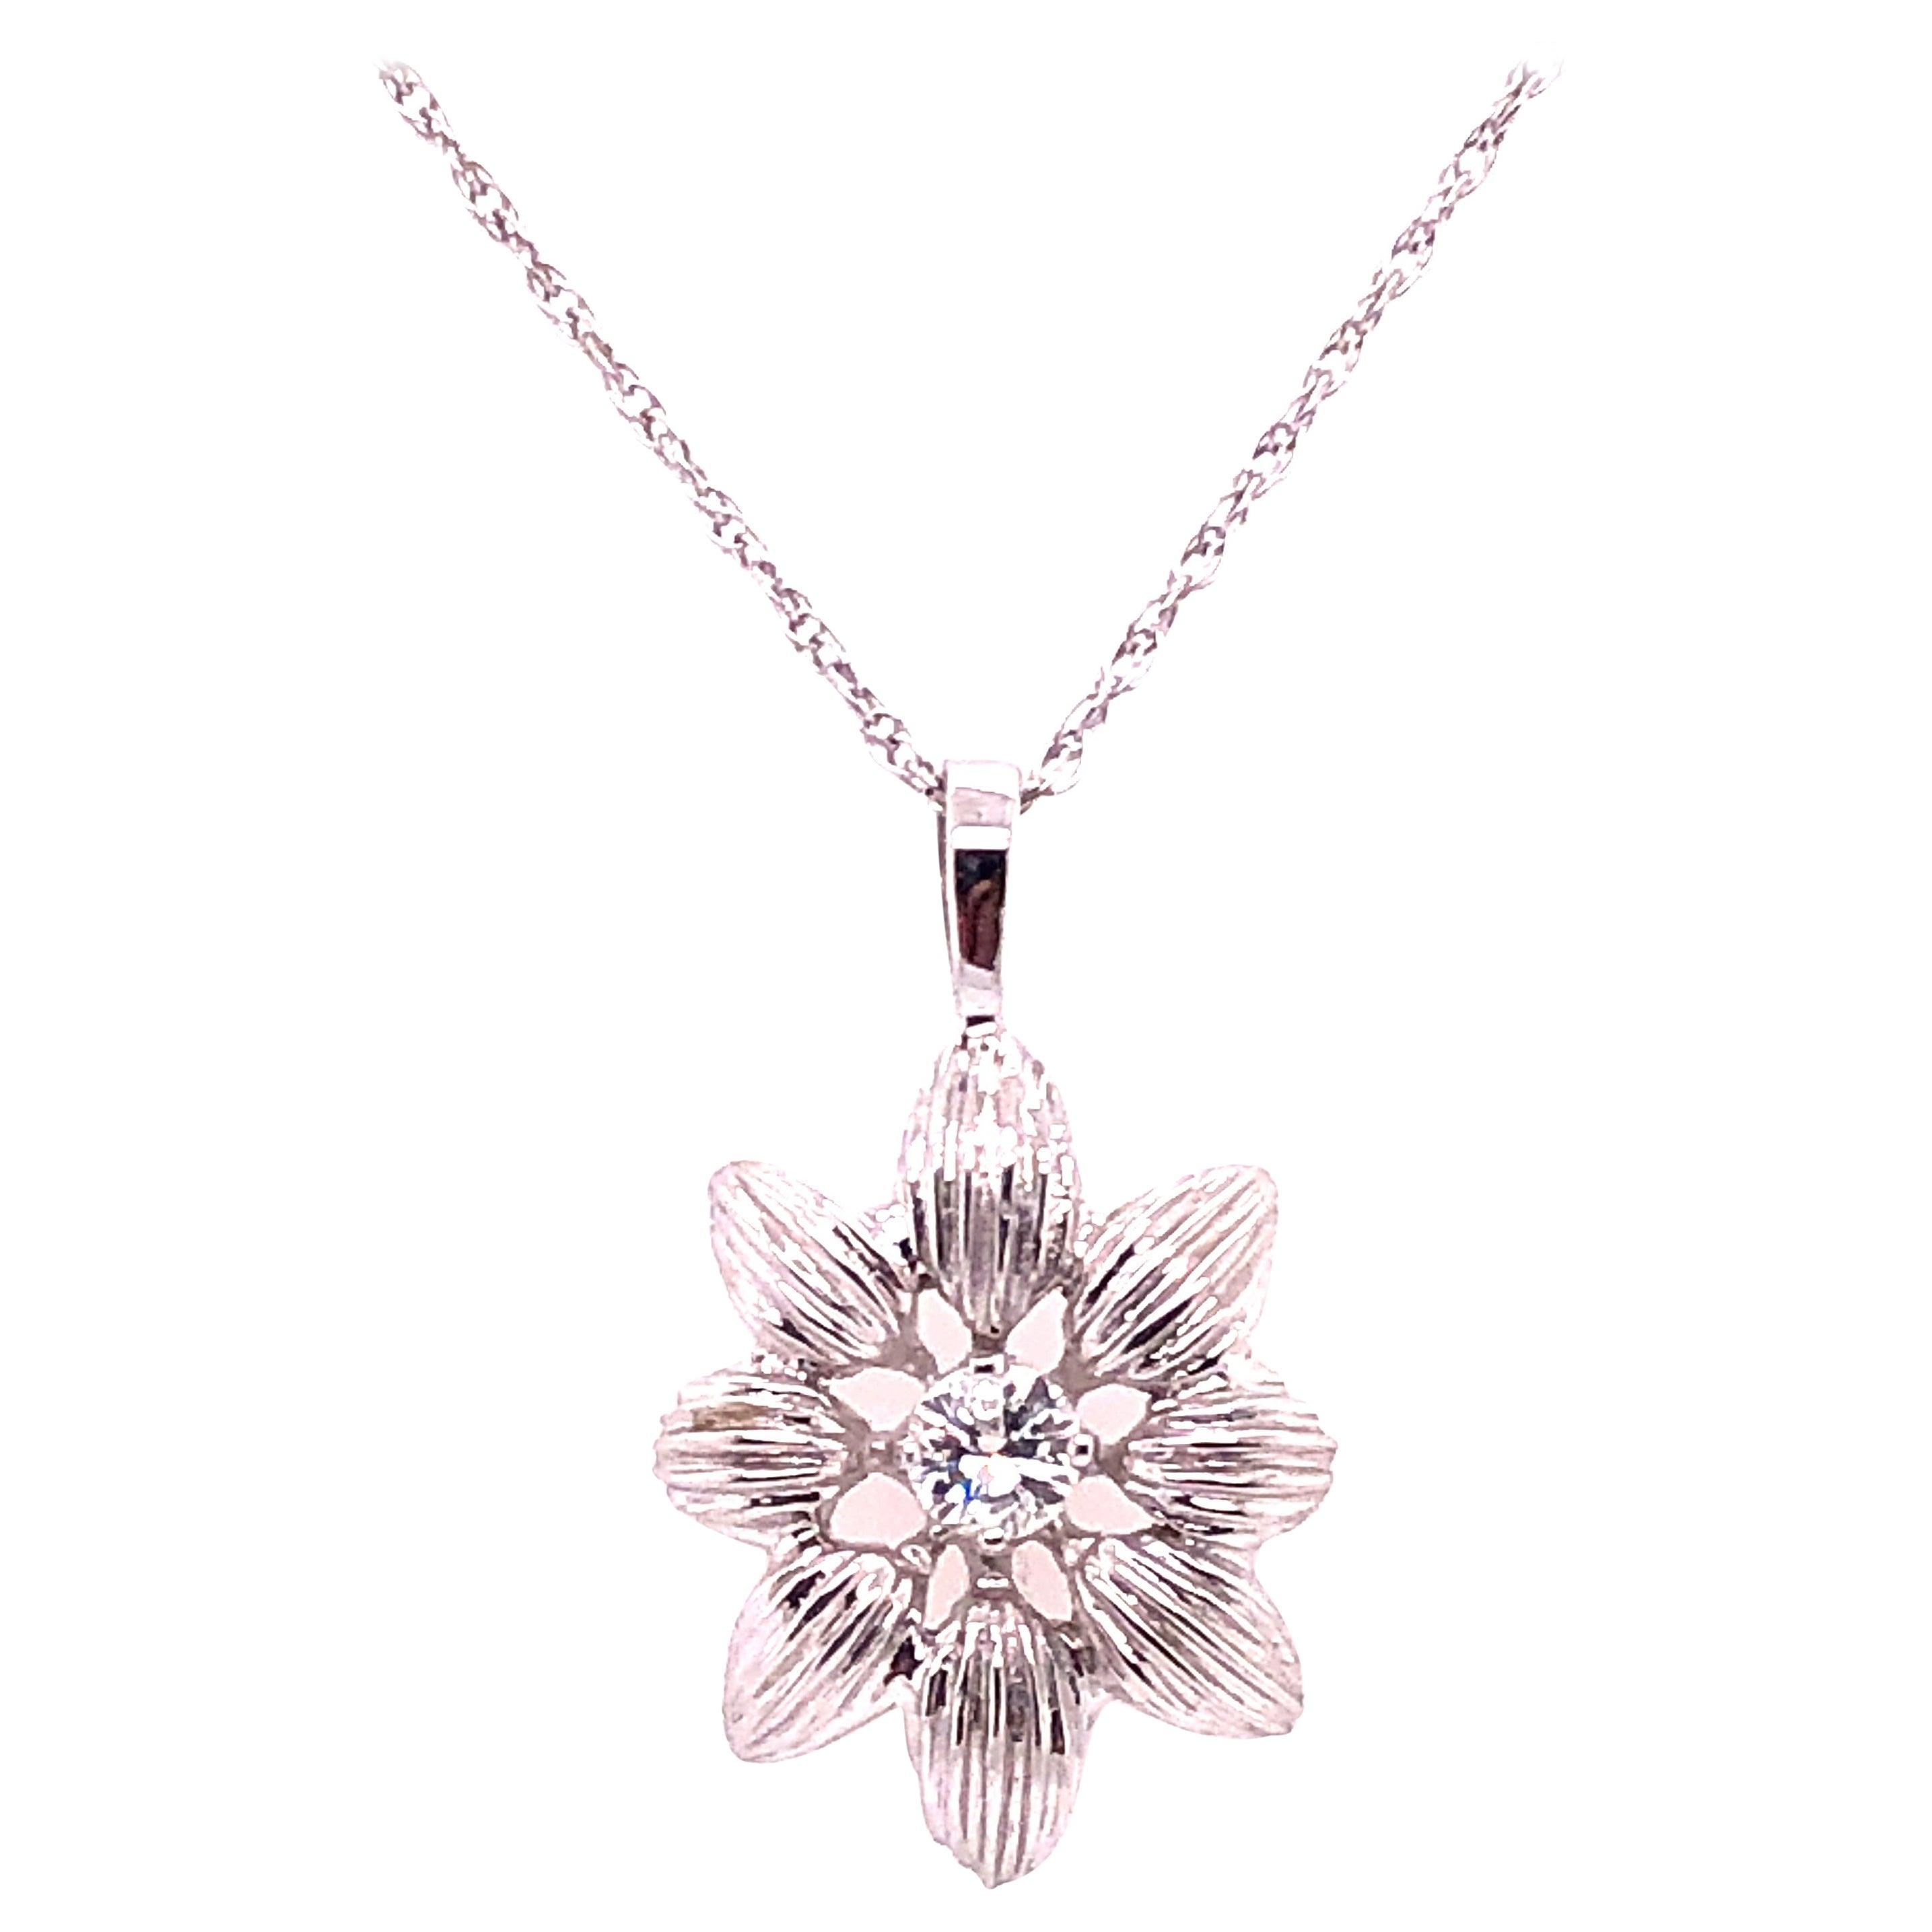 14 Karat White Gold Necklace with Diamond